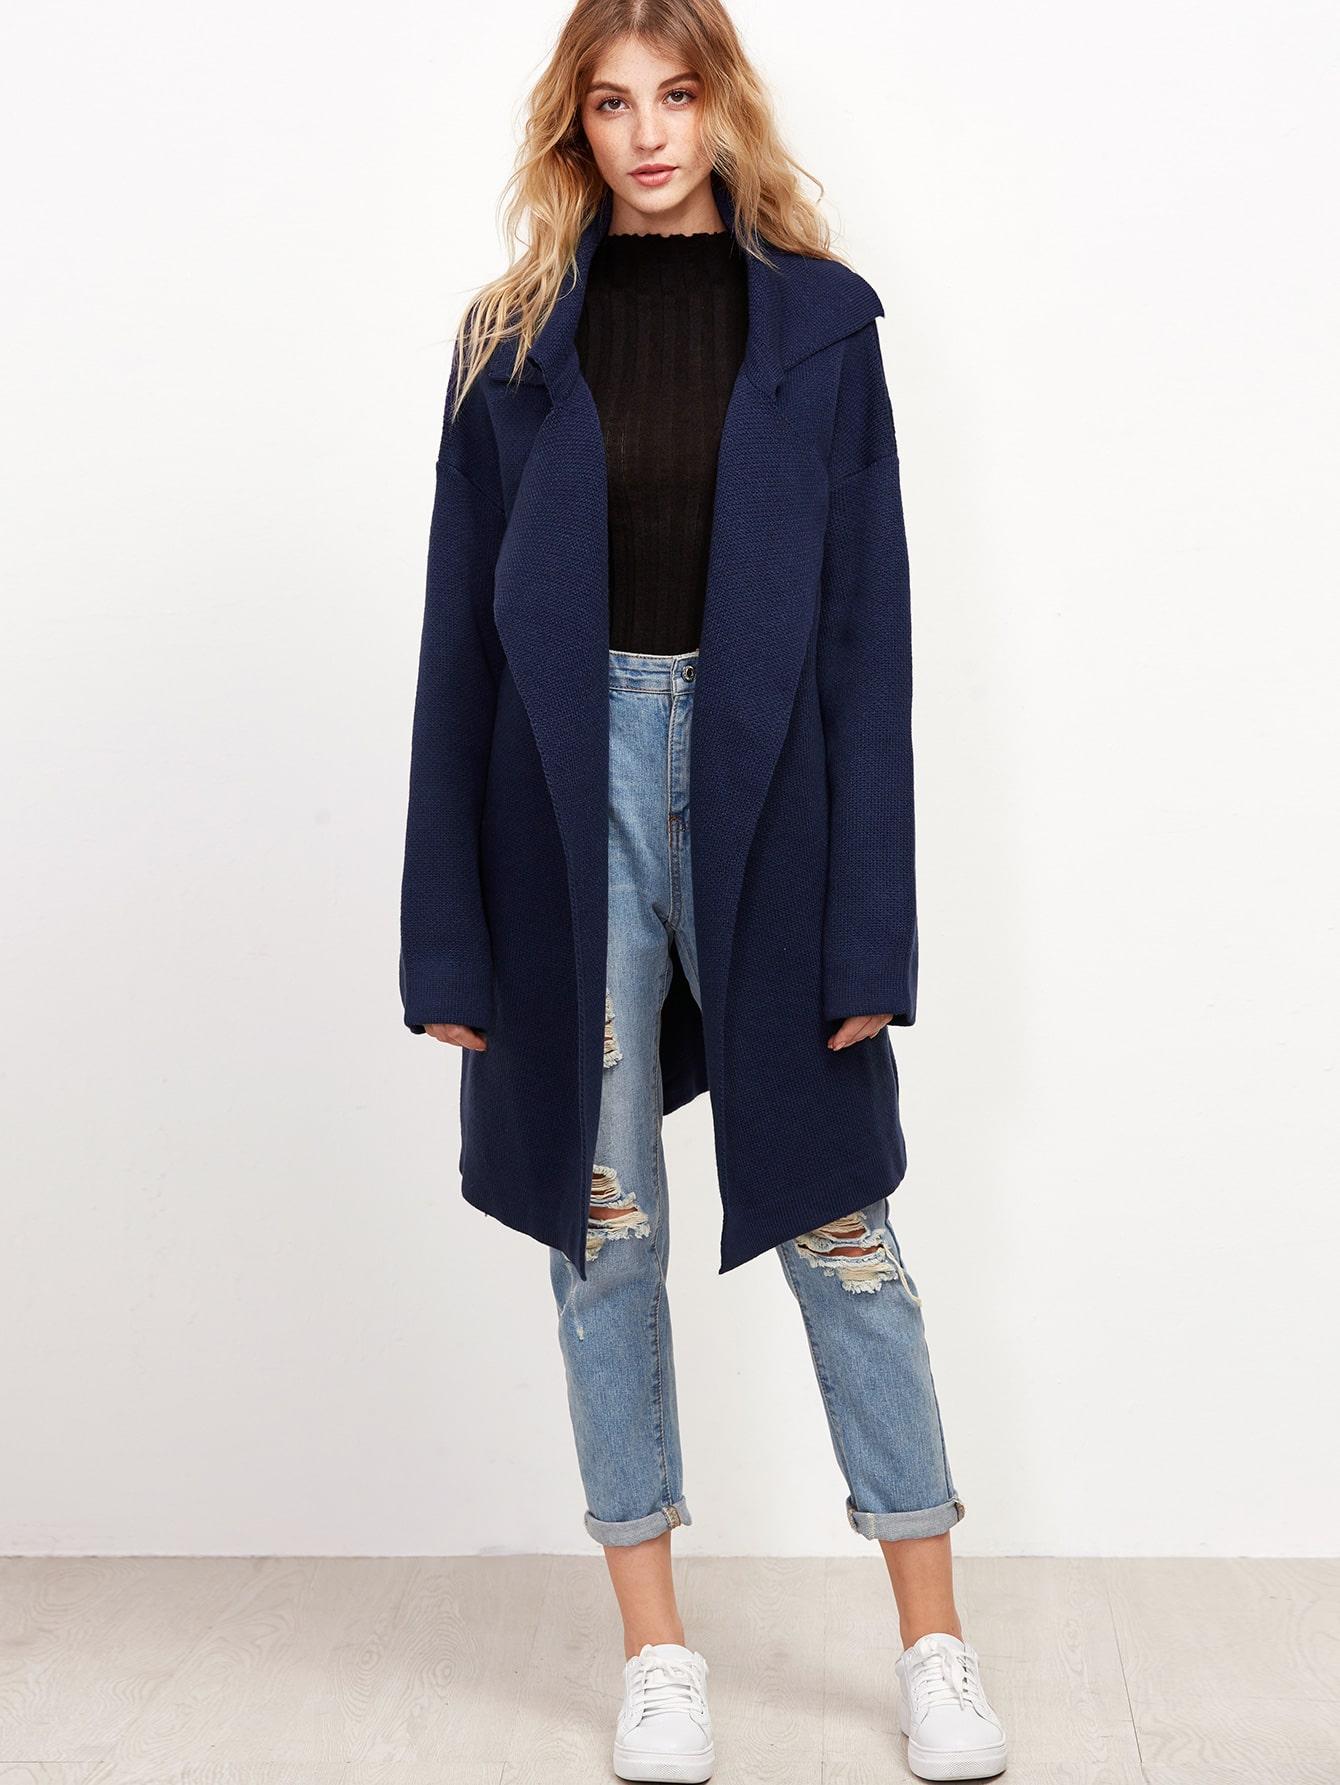 Navy Notch Collar Drop Shoulder Sweater Coat sweater161021403